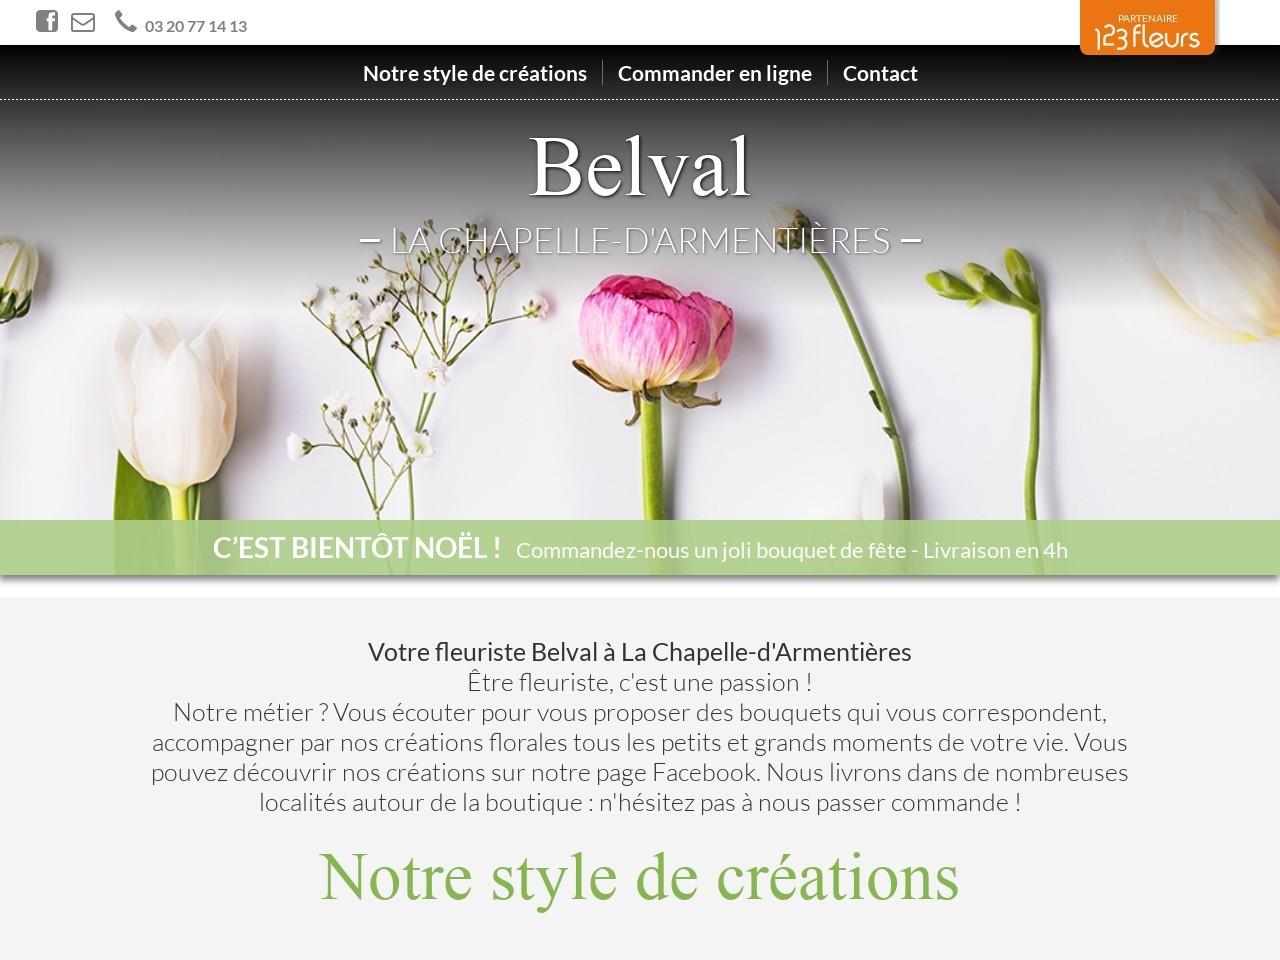 Site fleuriste Belval - 123fleurs